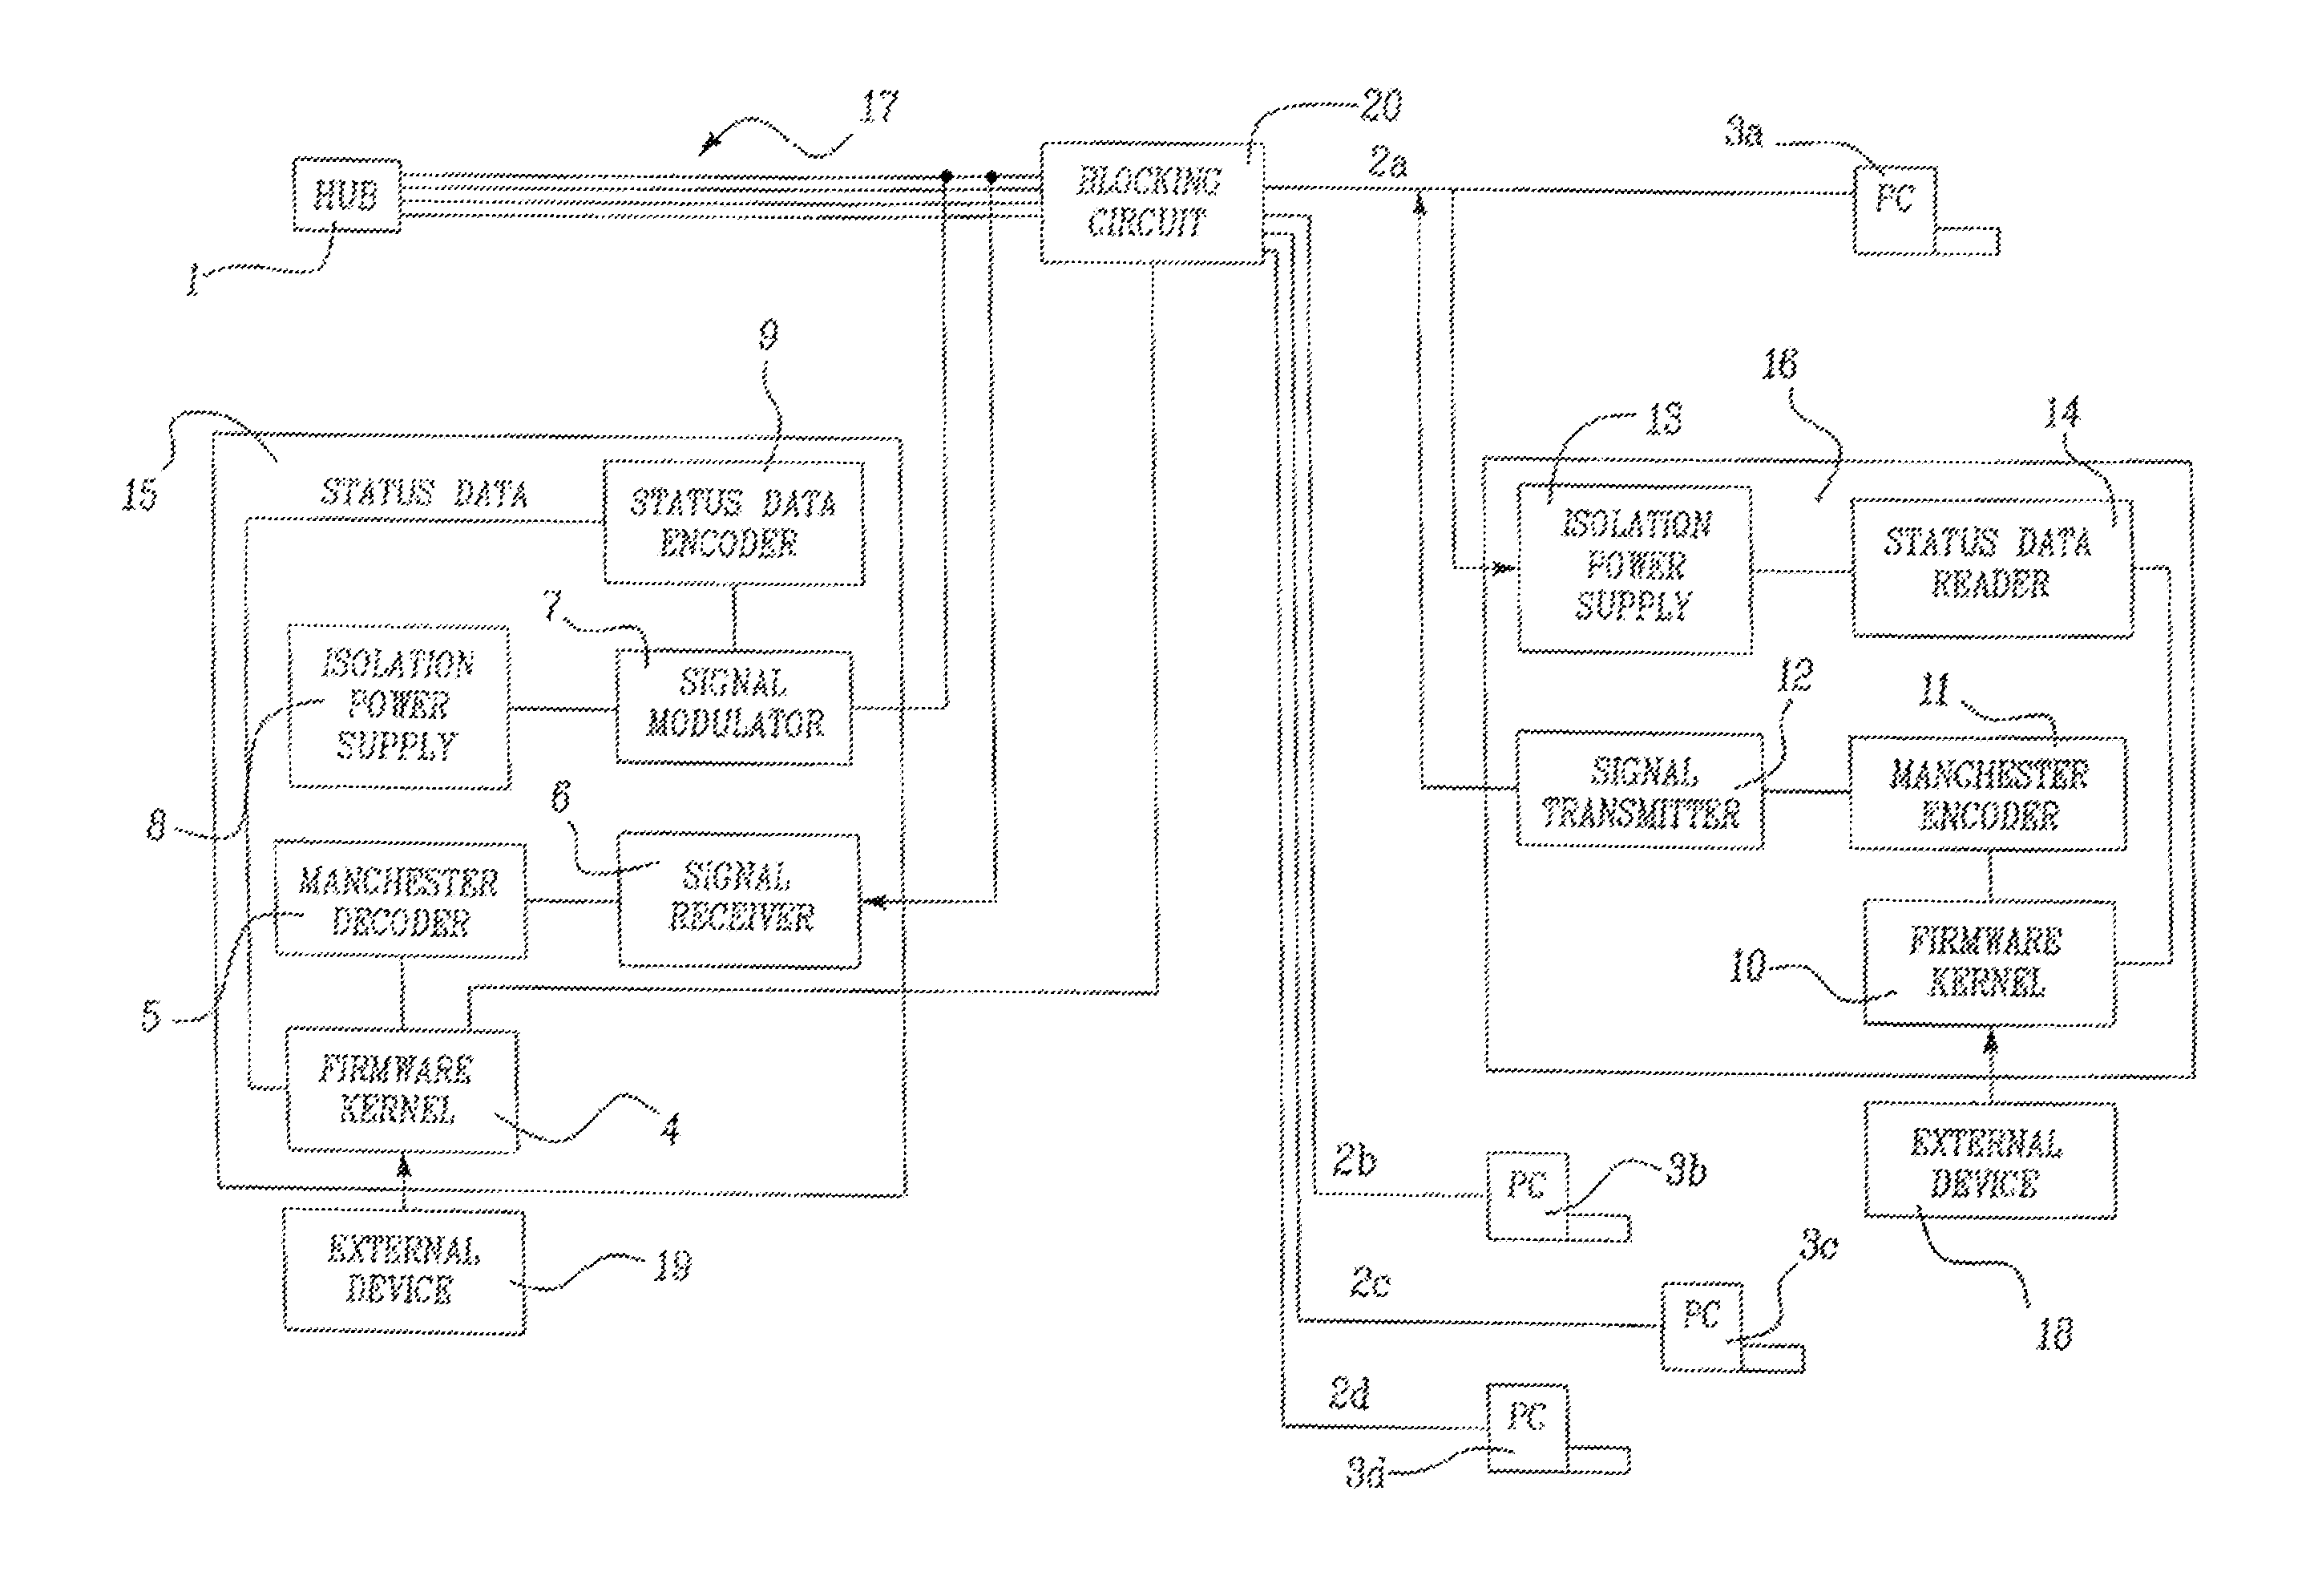 Patent Us 8942107 B2 Circuit Used On Cnc Cutting Machine Communicationcircuit First Claim